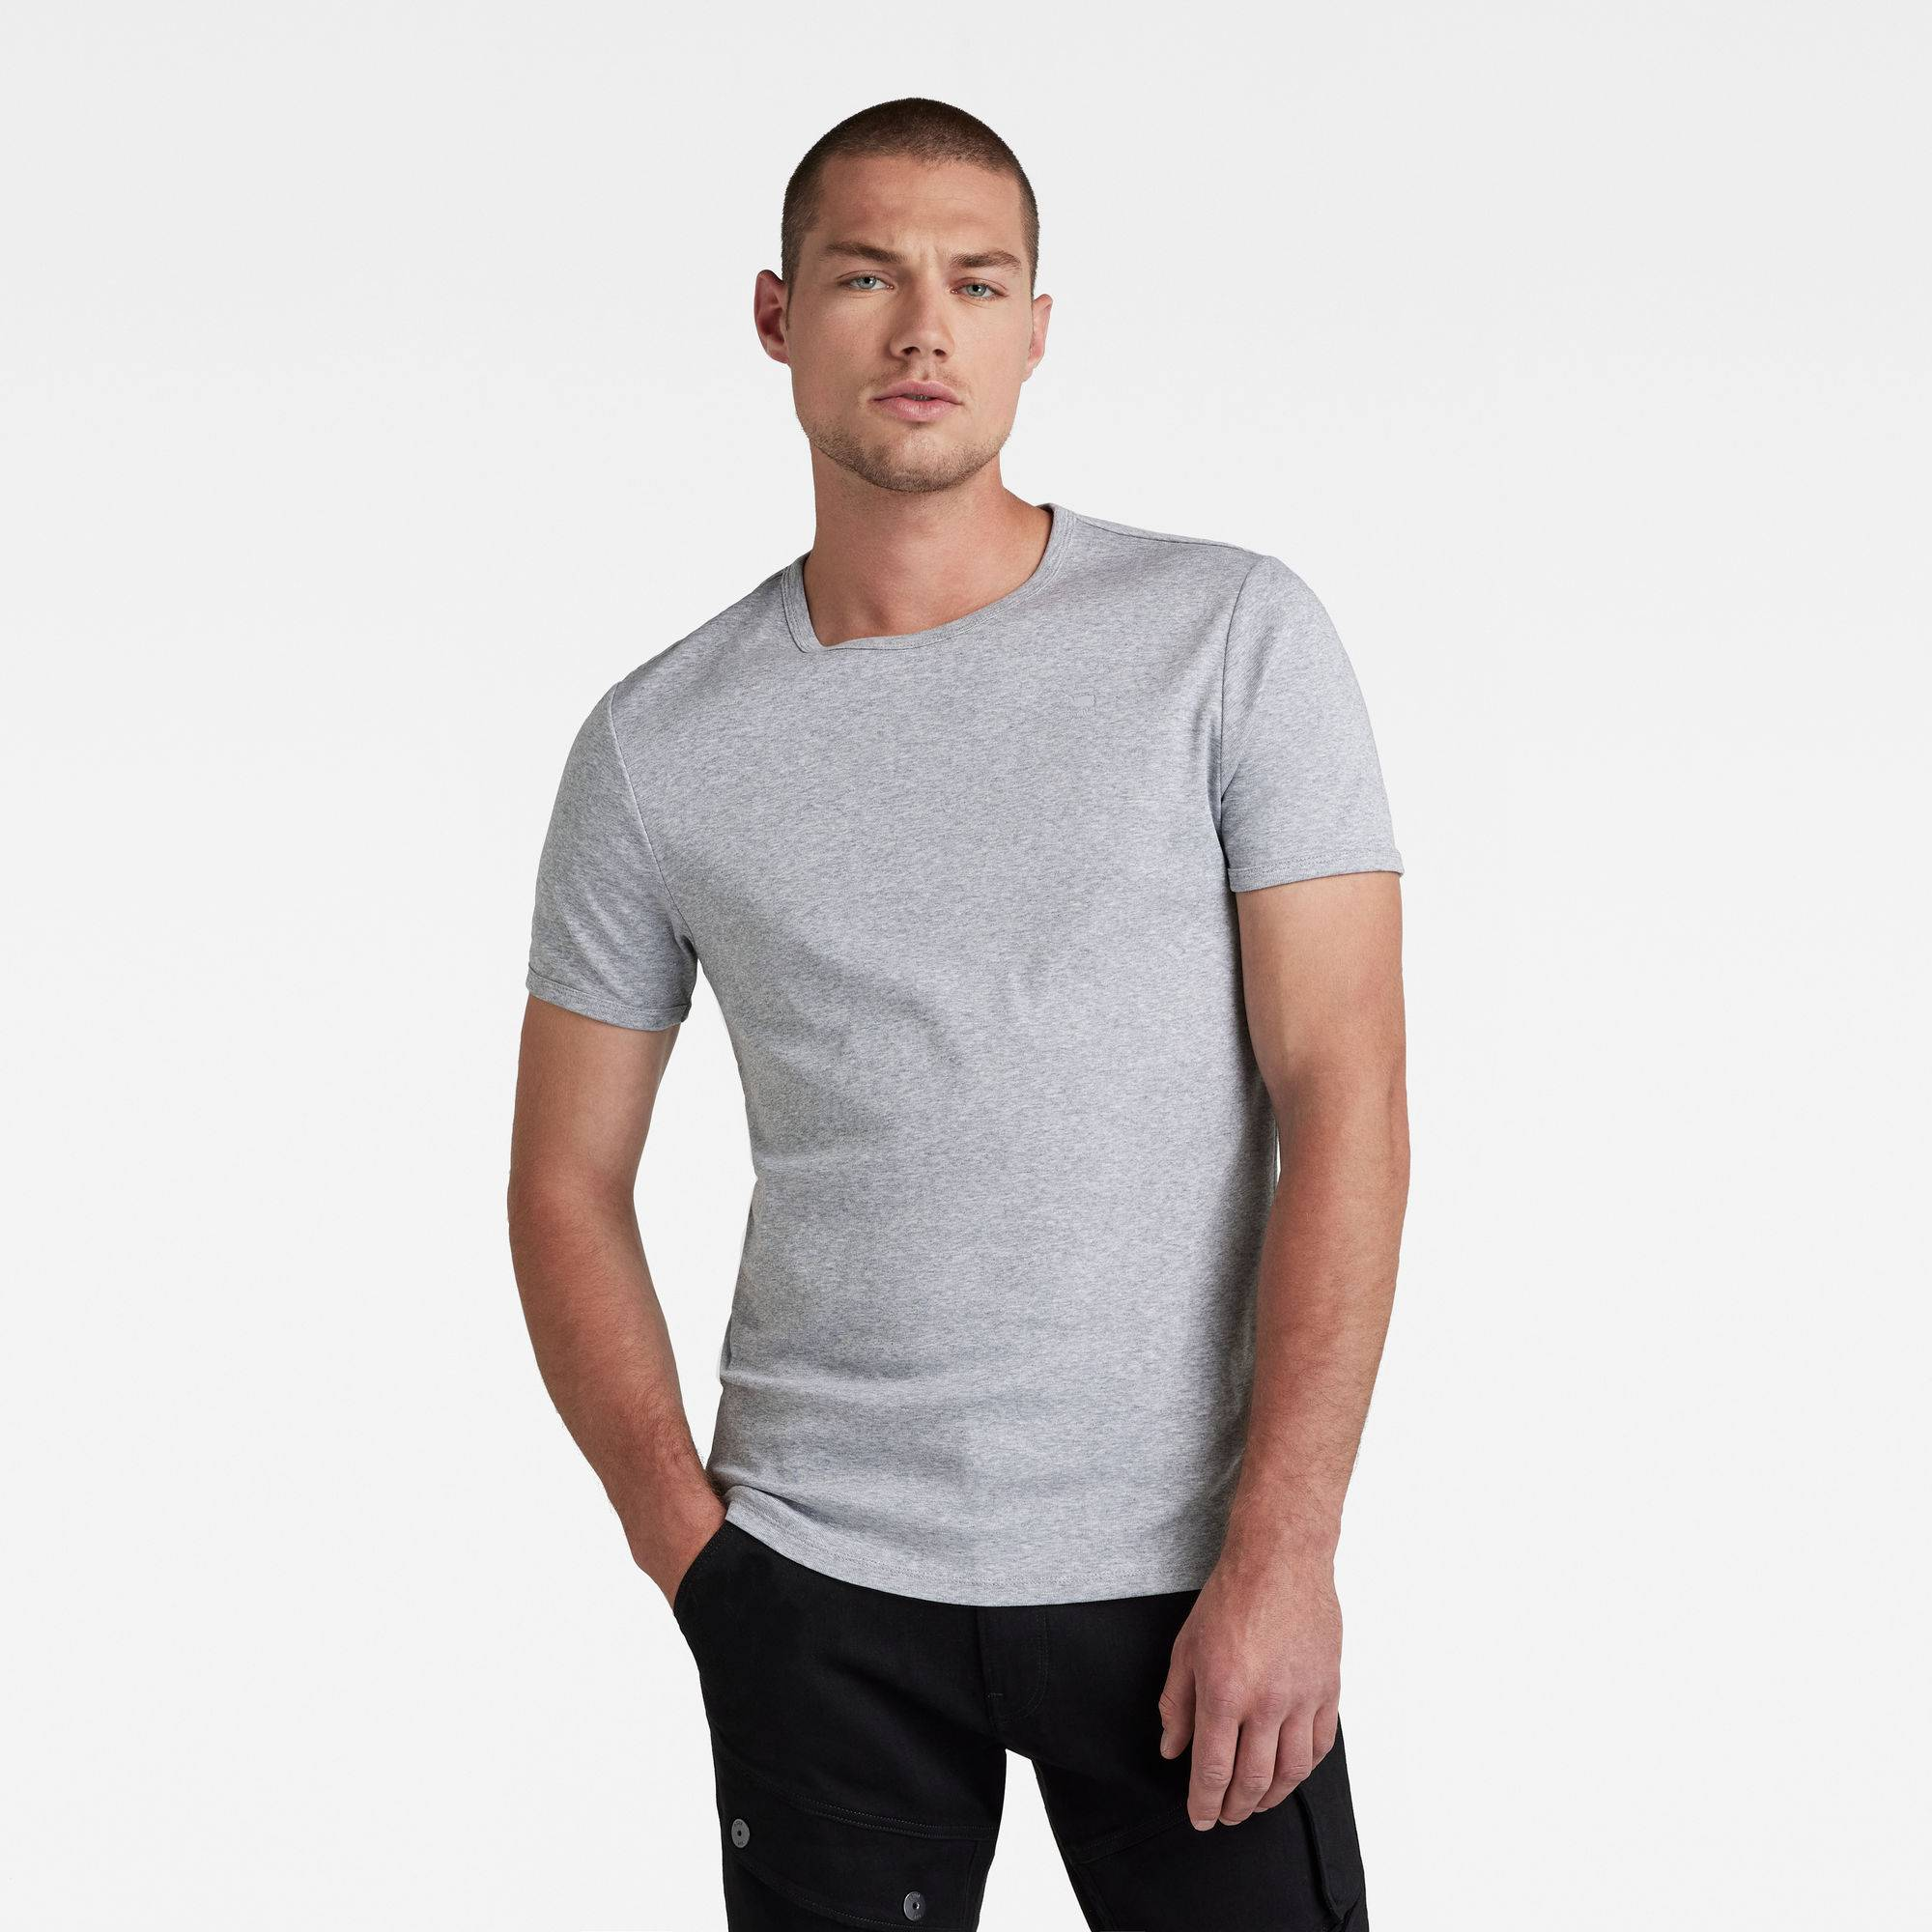 G-star RAW Hommes Lot de 2 t-shirts Base Gris  - Taille: XL XXS XXL XS S M L